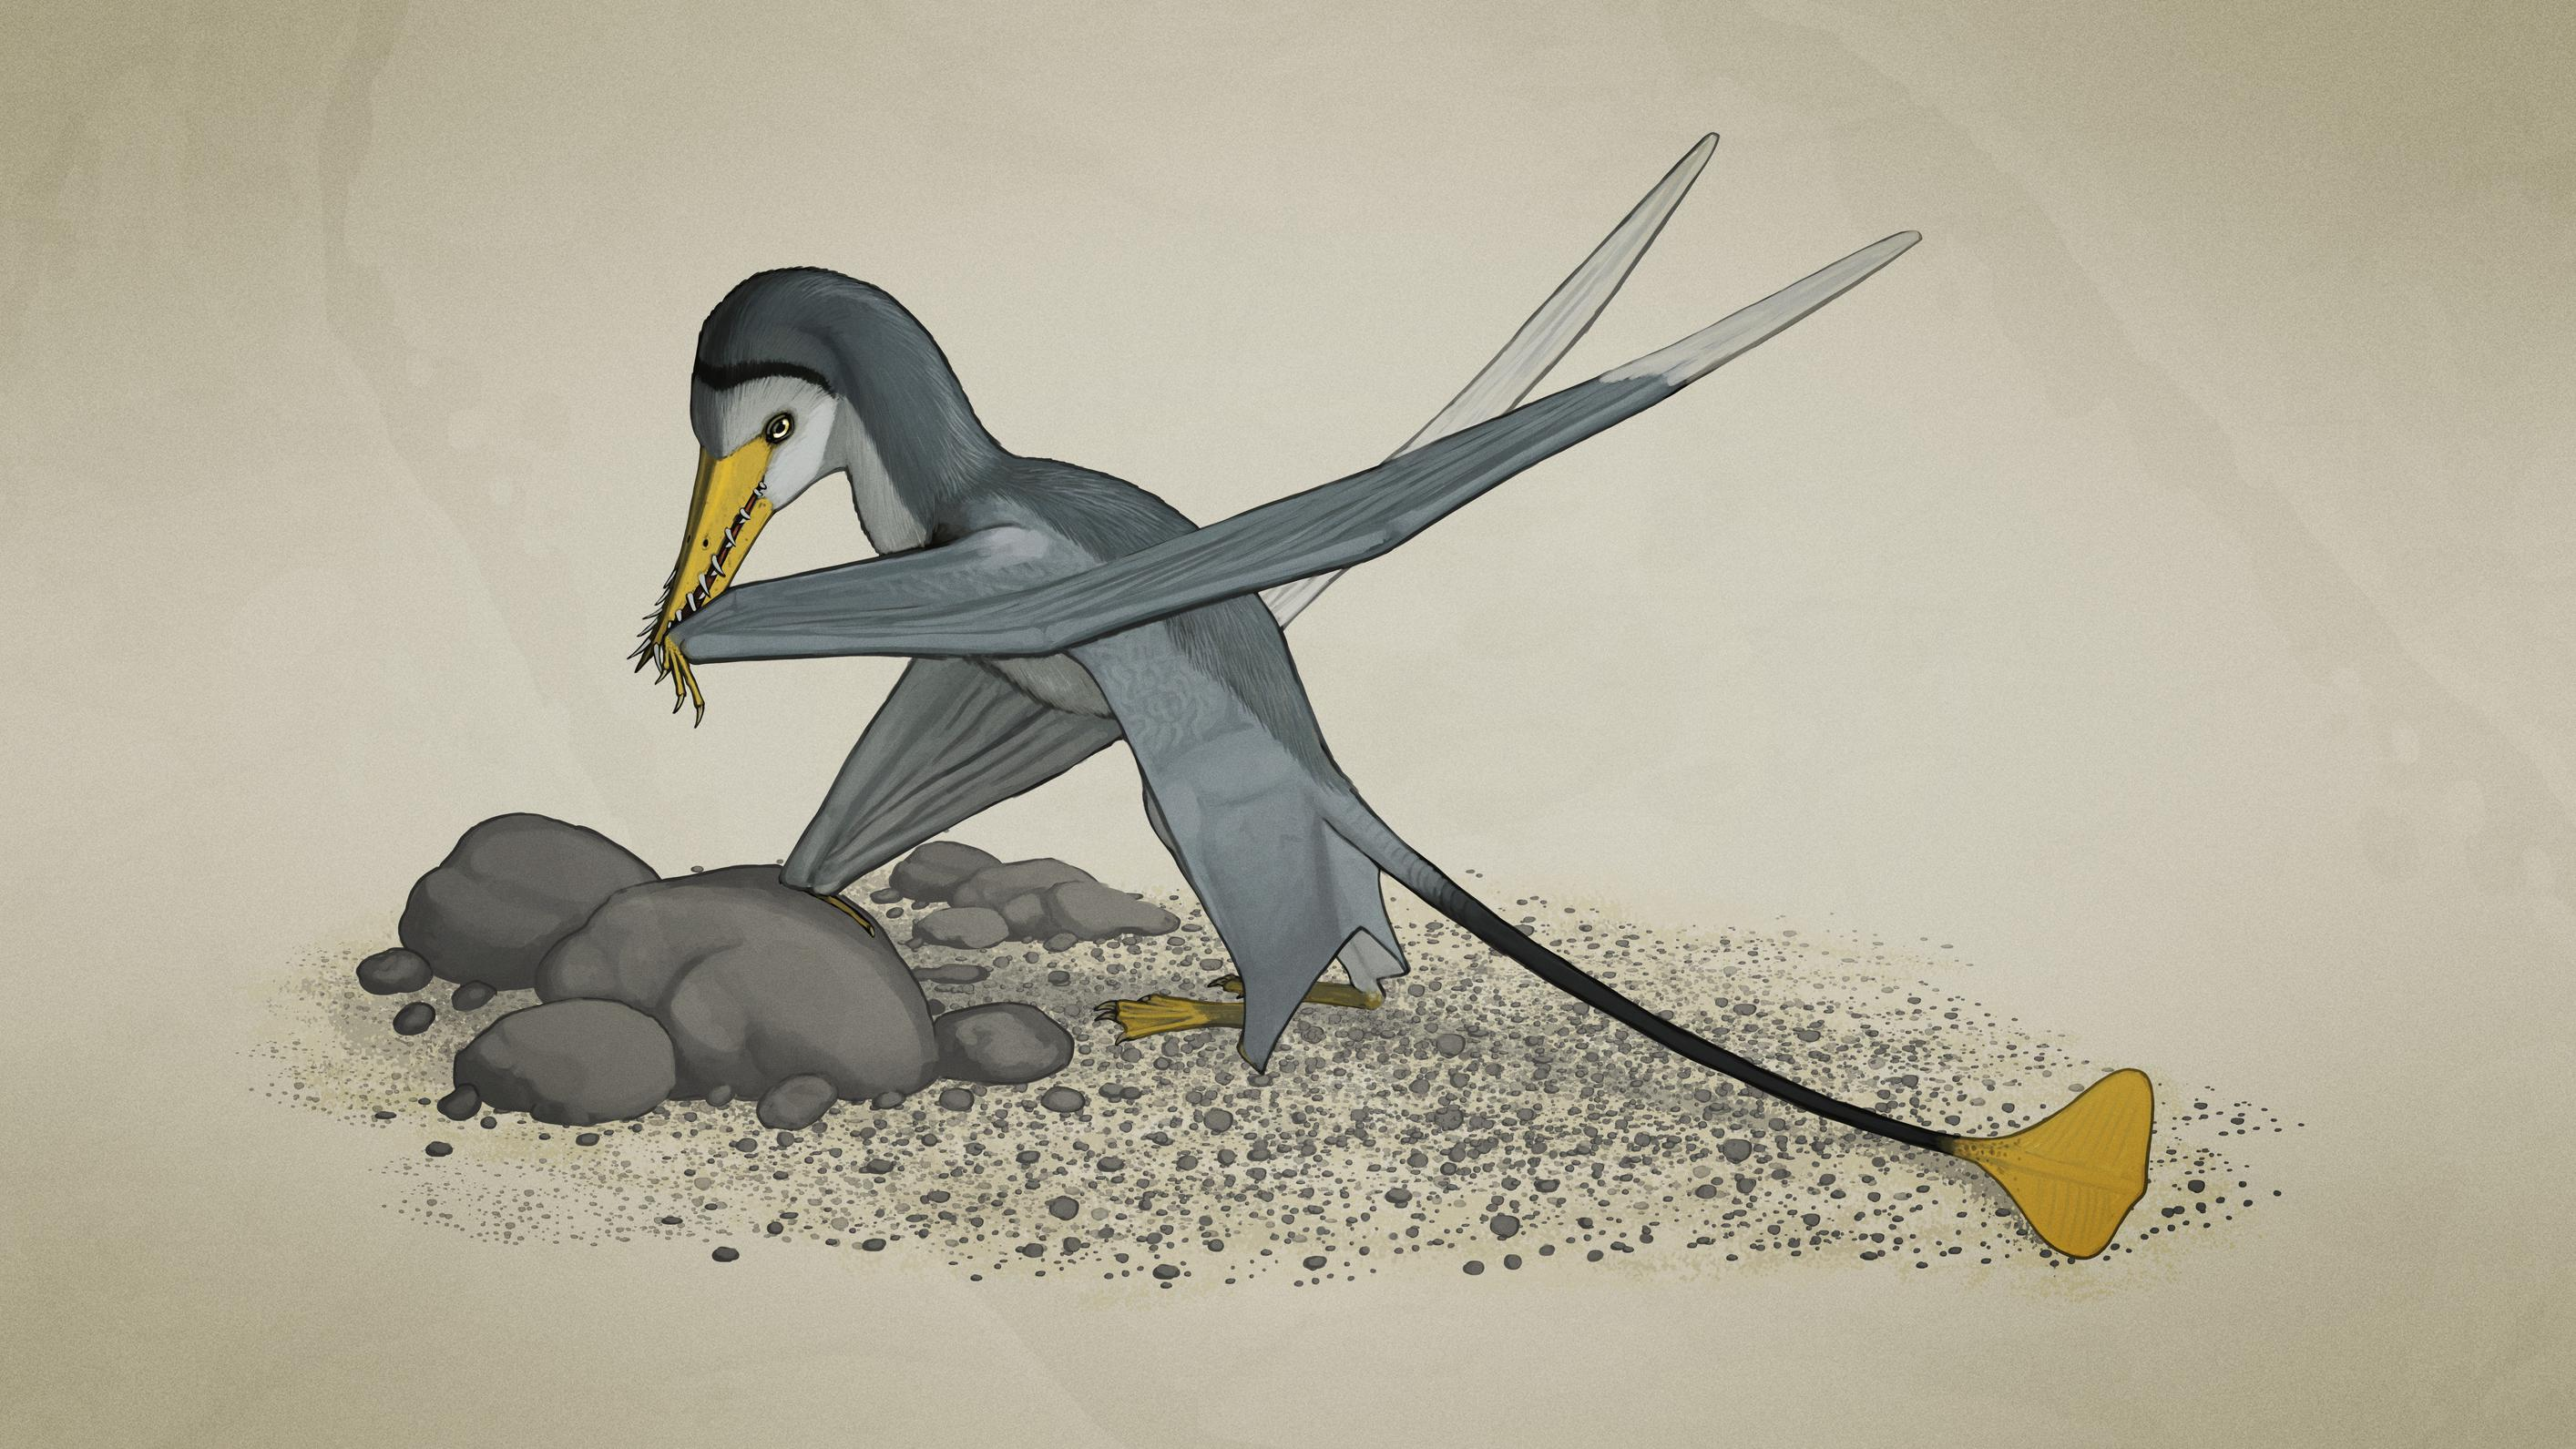 palaeo, pterosaurs, painting, jurassic, rhamphorhynchus, rhamphorhynchoids, solnhofen